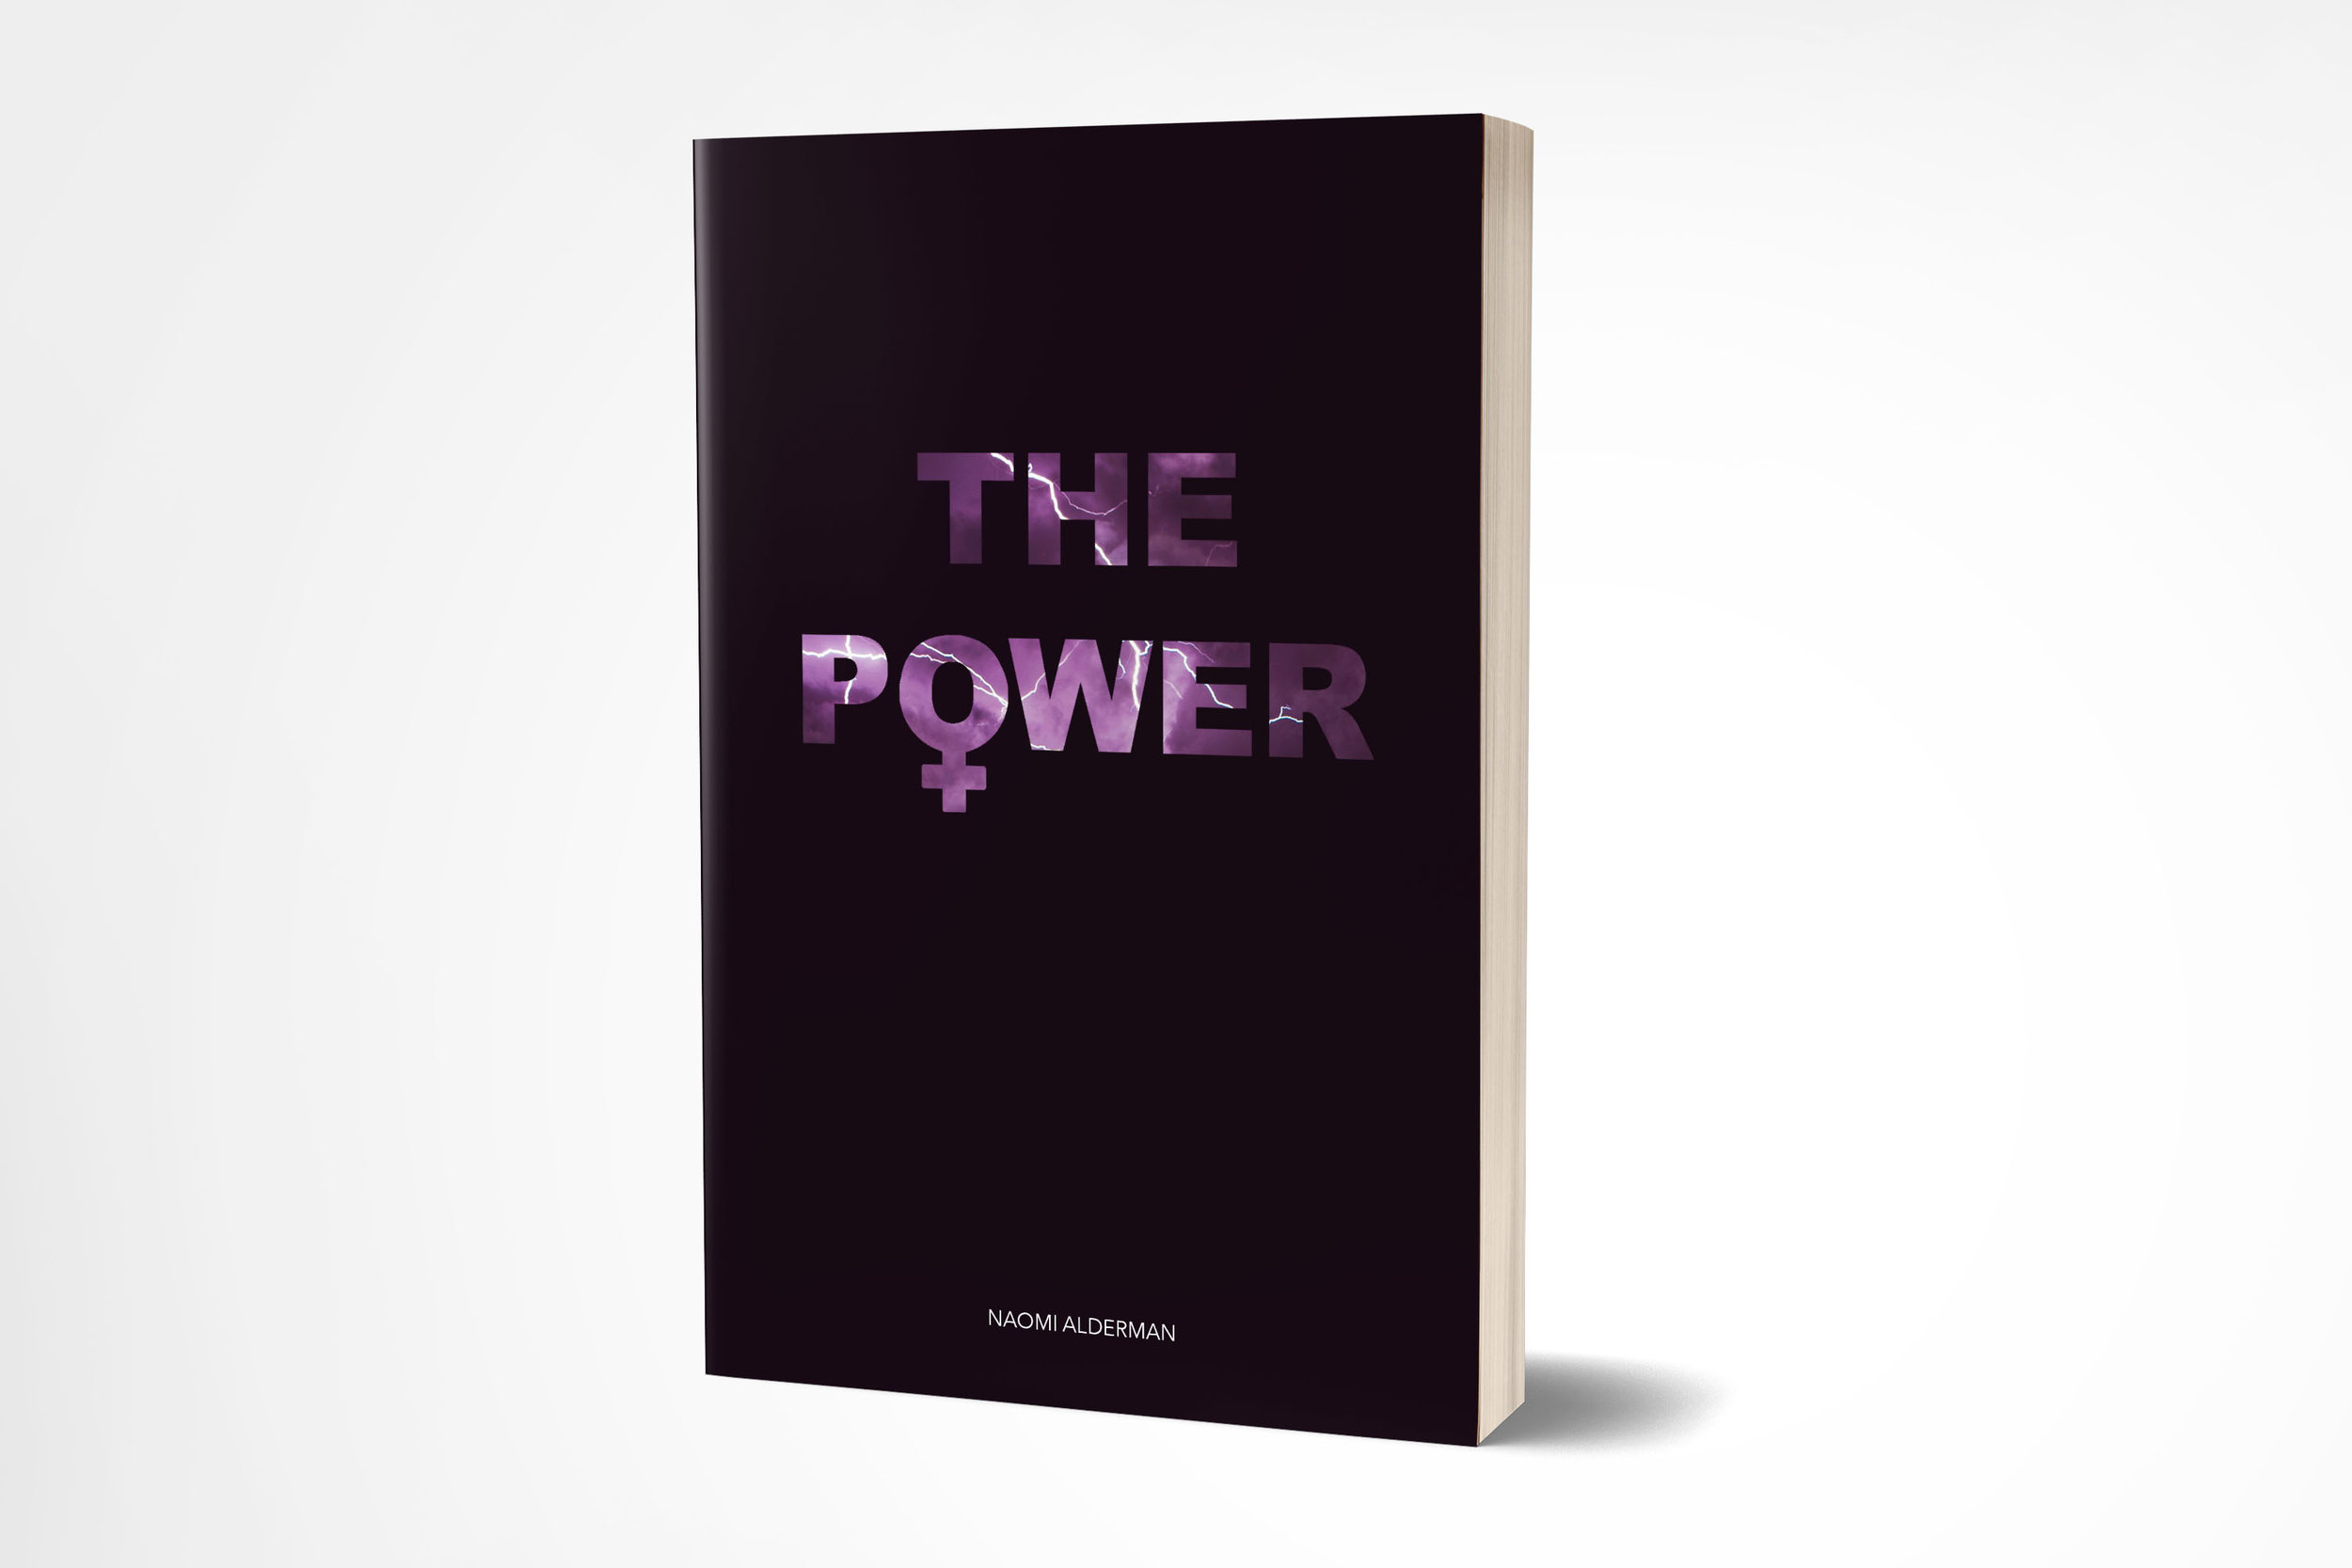 The+power+mockup1.jpg